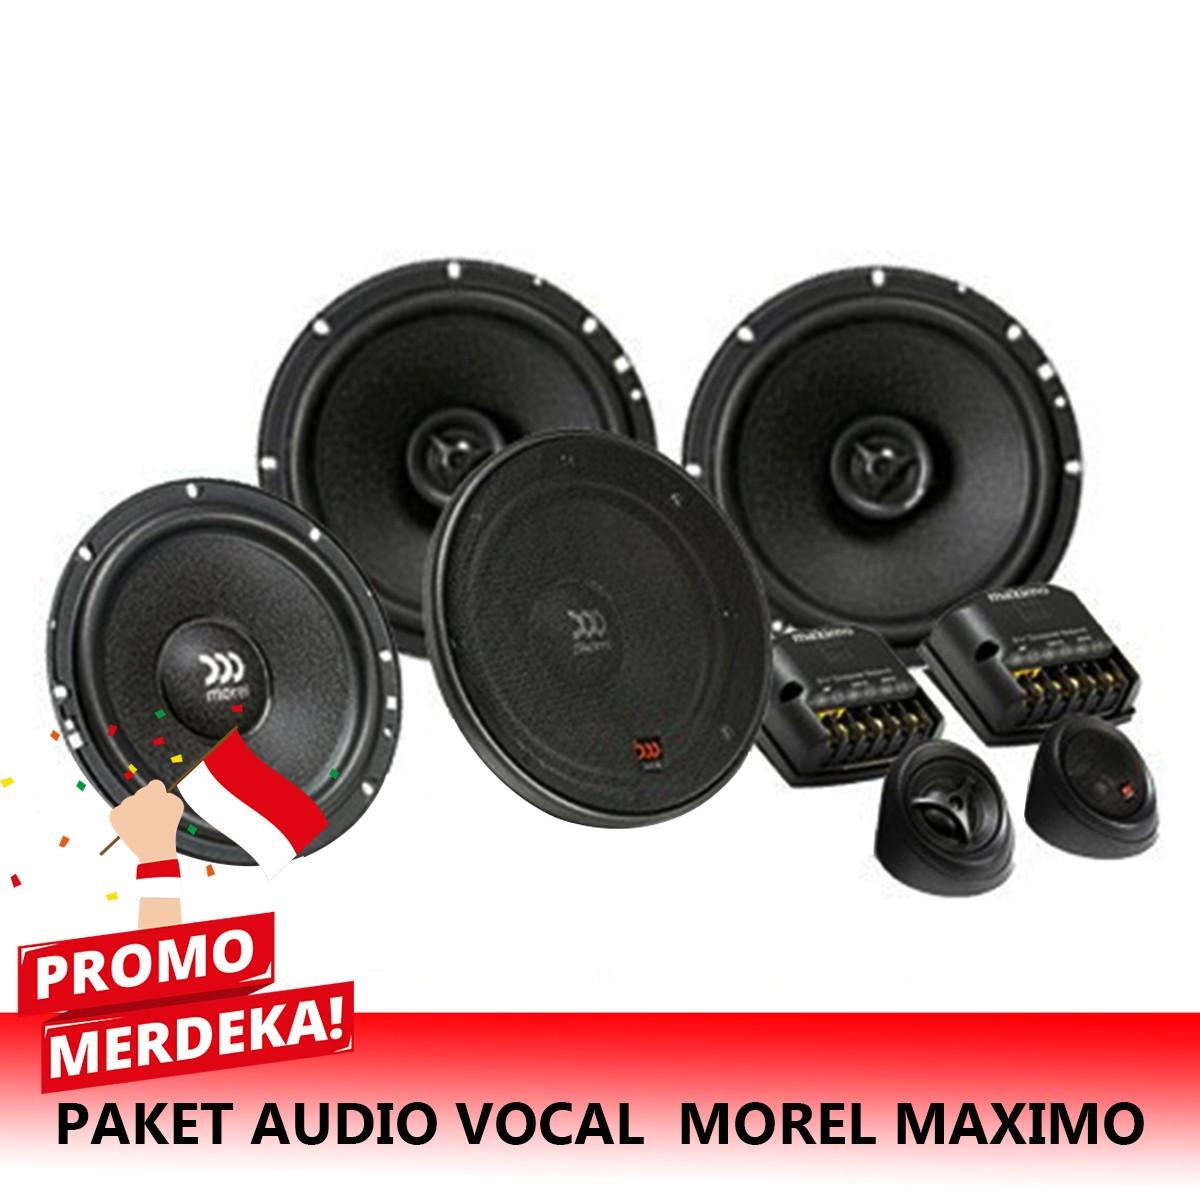 MERDEKA | PAKET AUDIO VOCAL  MOREL MAXIMO